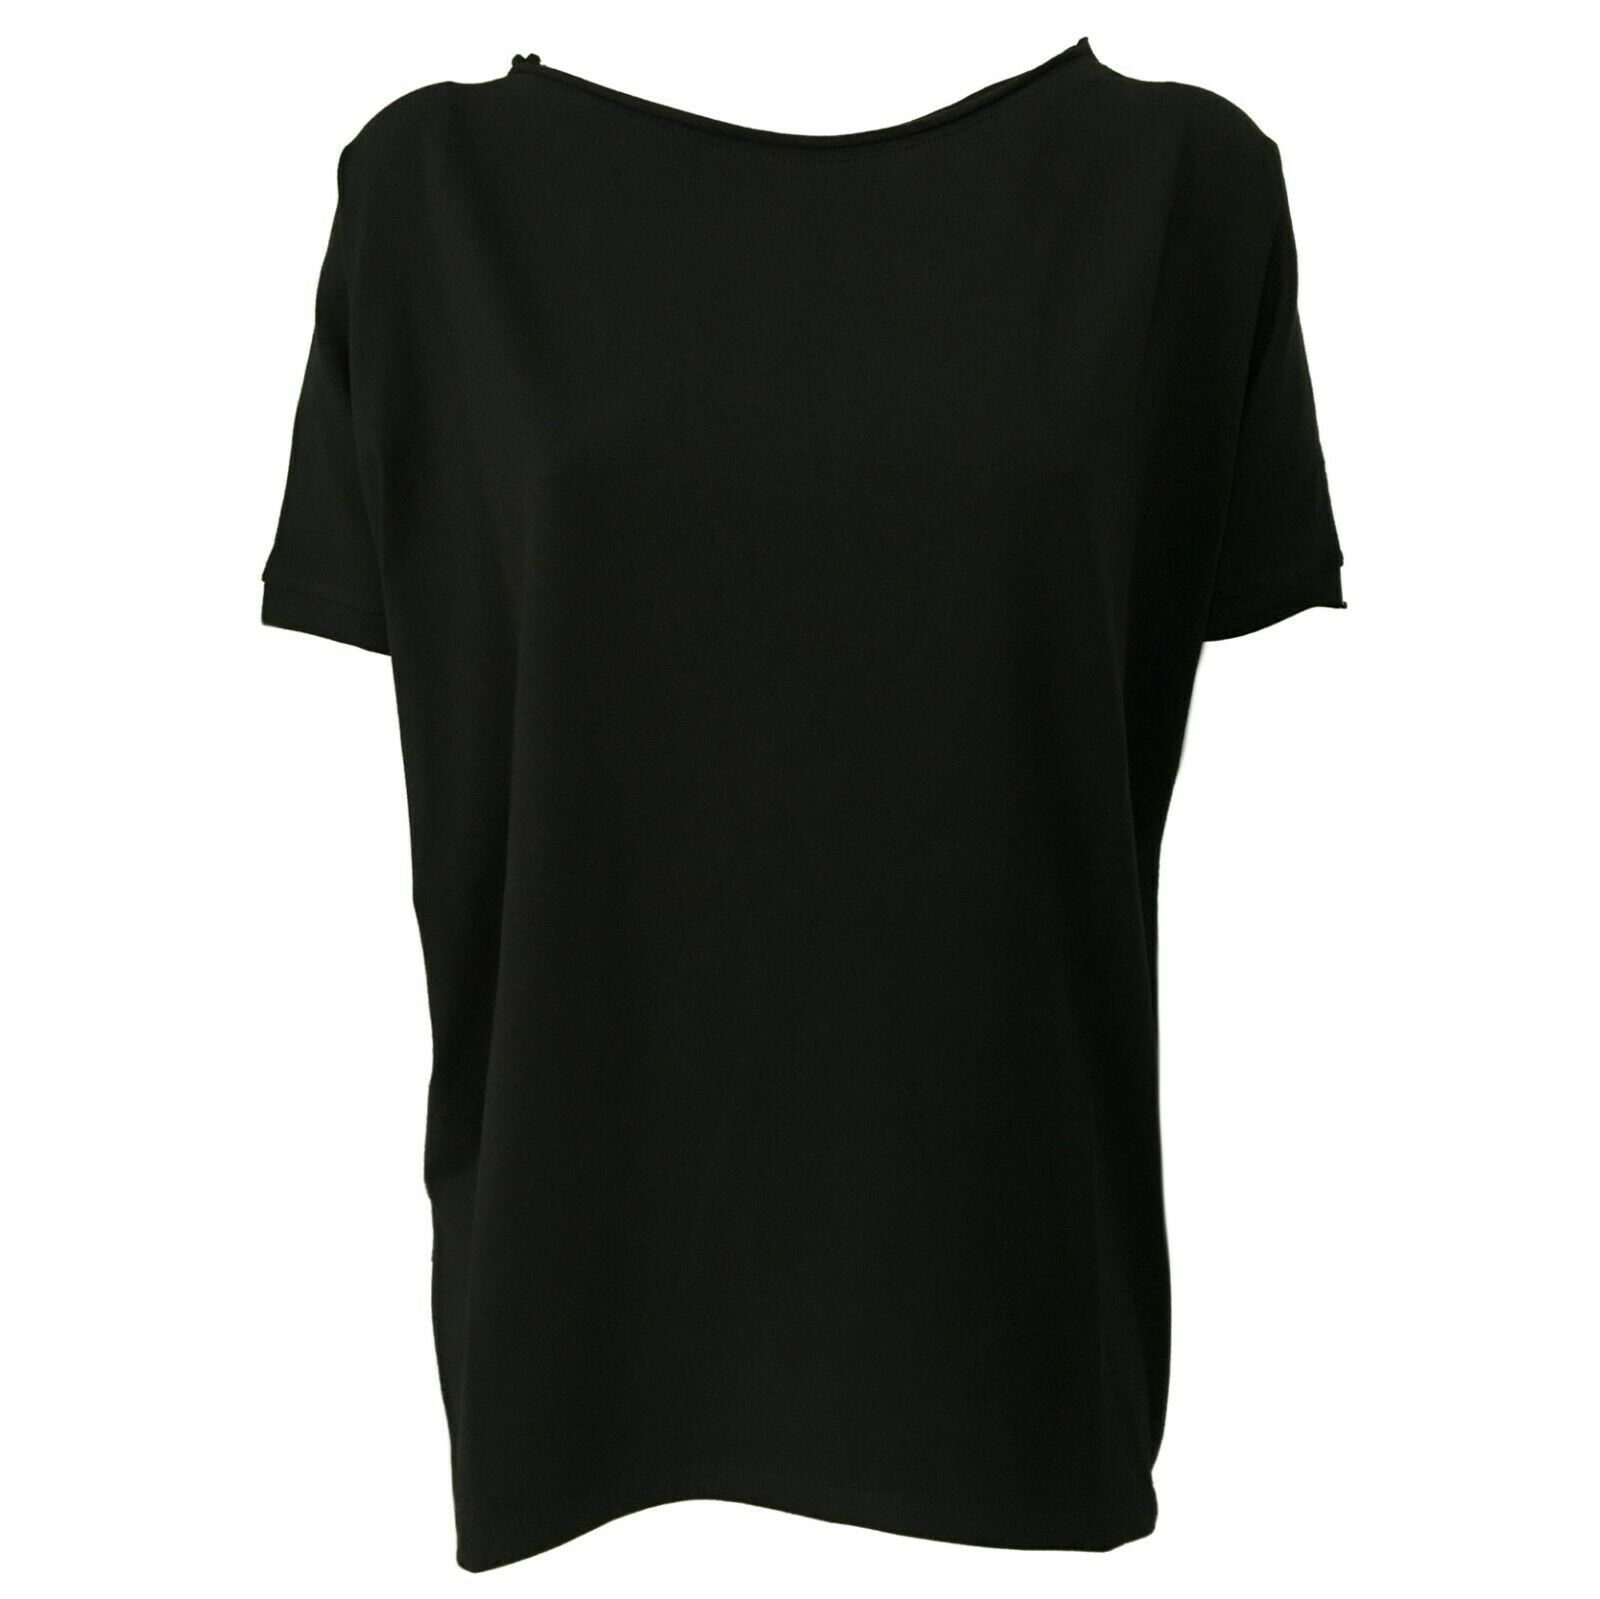 Maxi T-Shirt Femme Coton schwarz Manches Courtes Neirami Article B01 Made IN